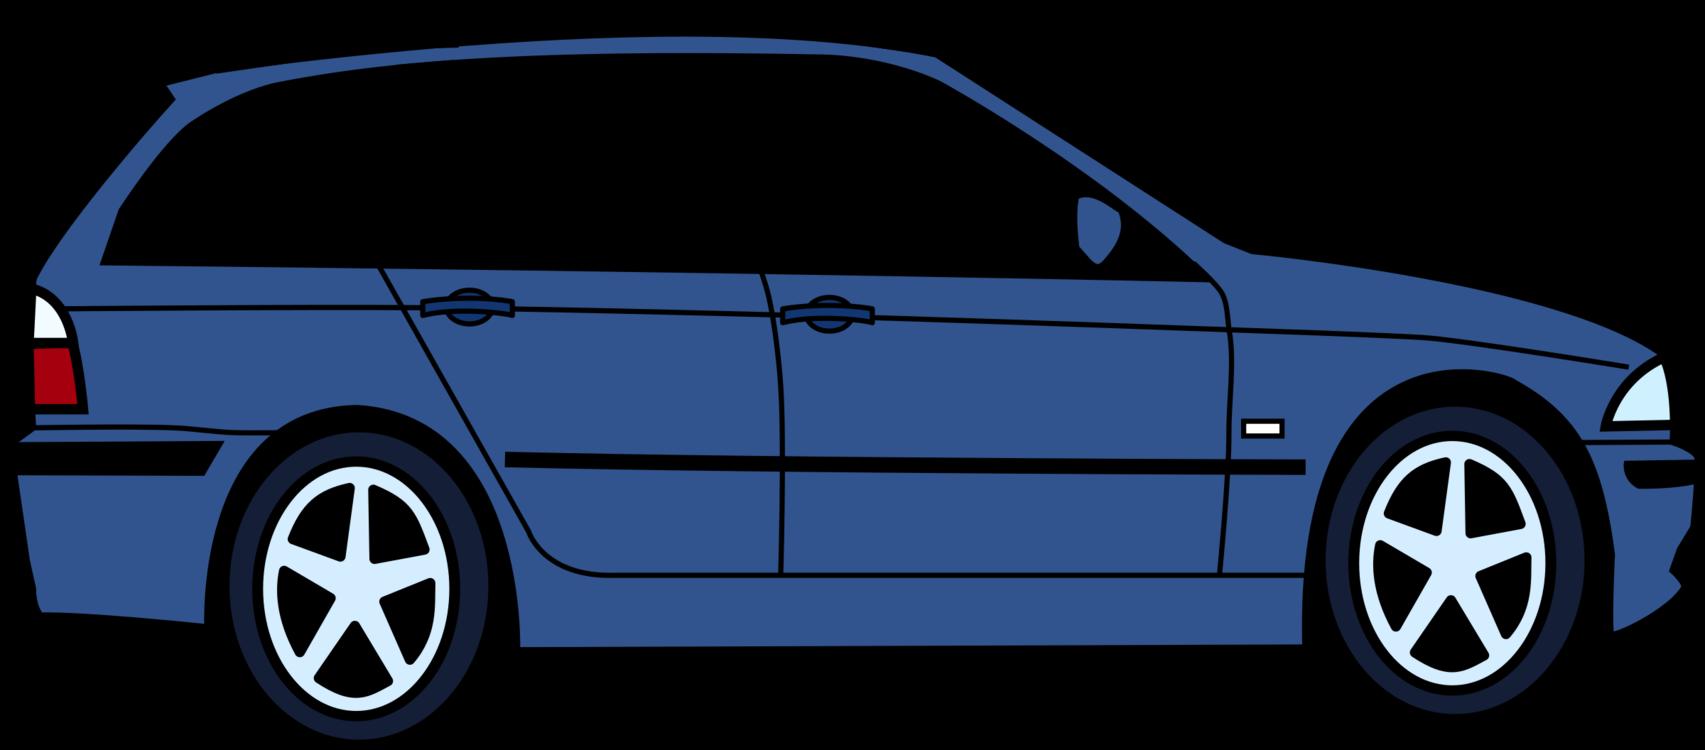 Wheel,Family Car,Automotive Exterior Clipart